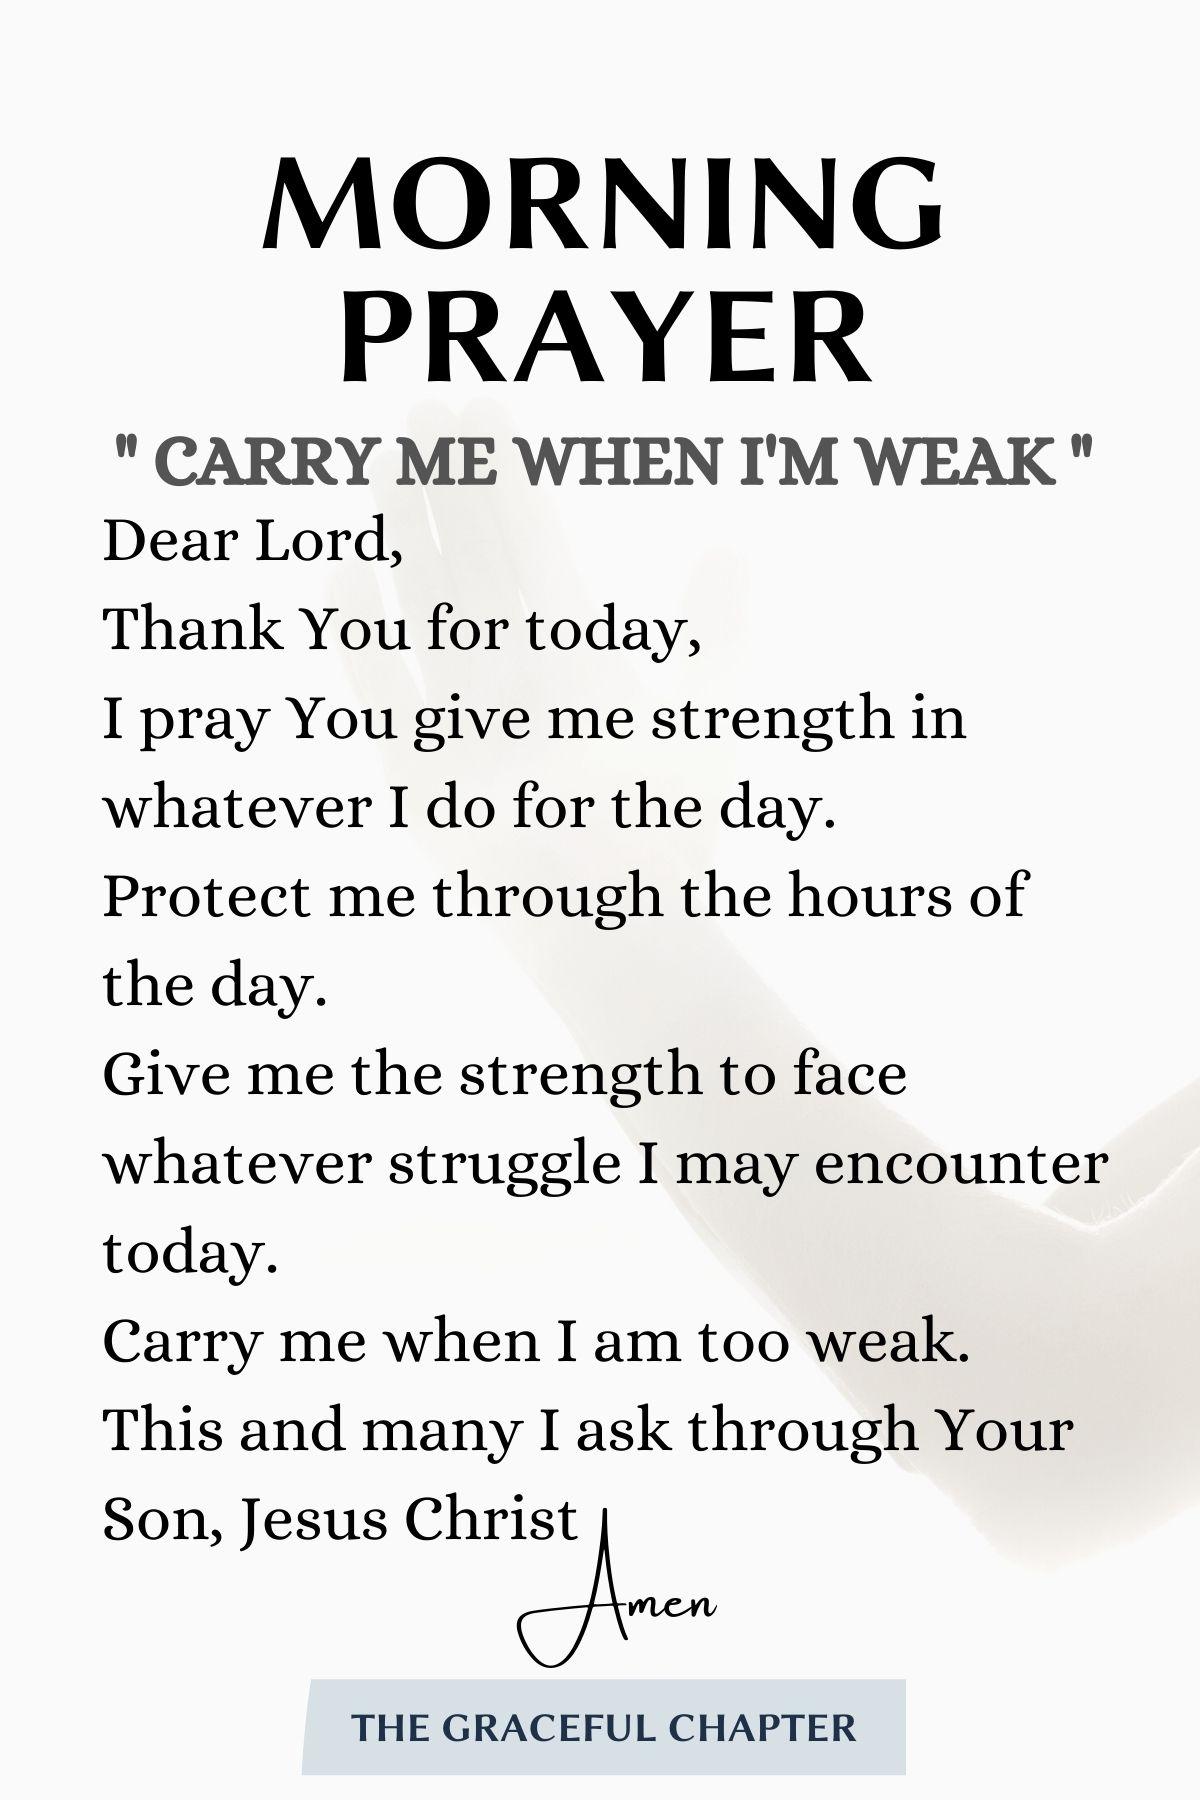 Carry me when I'm weak